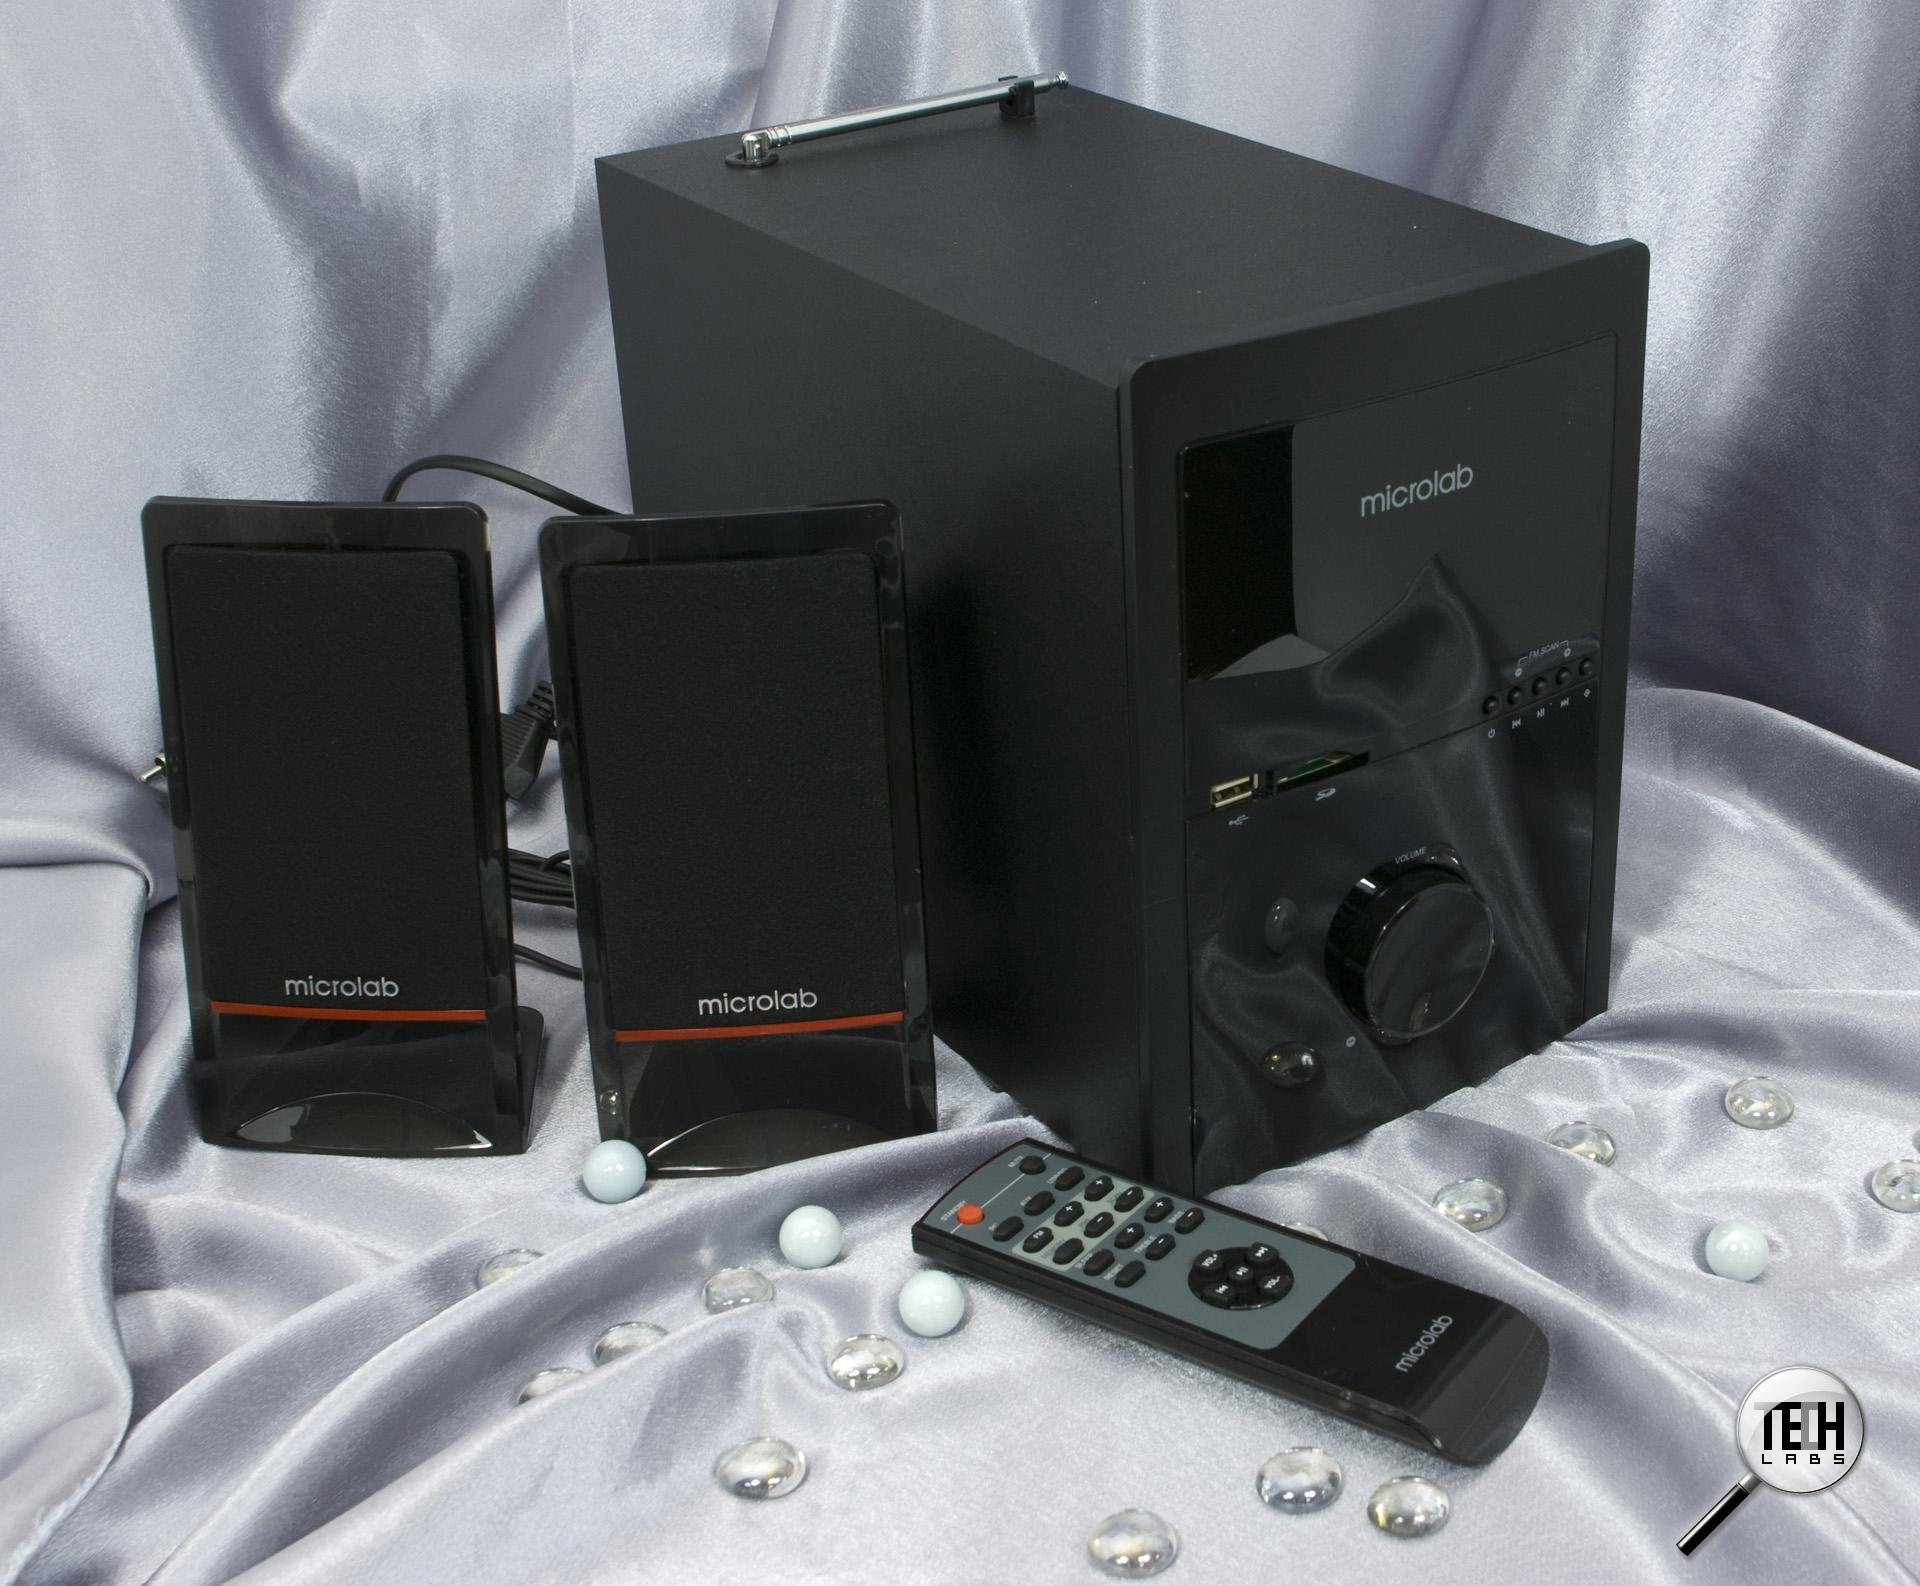 Microlab M700u 2.1 speaker system | ClickBD large image 0